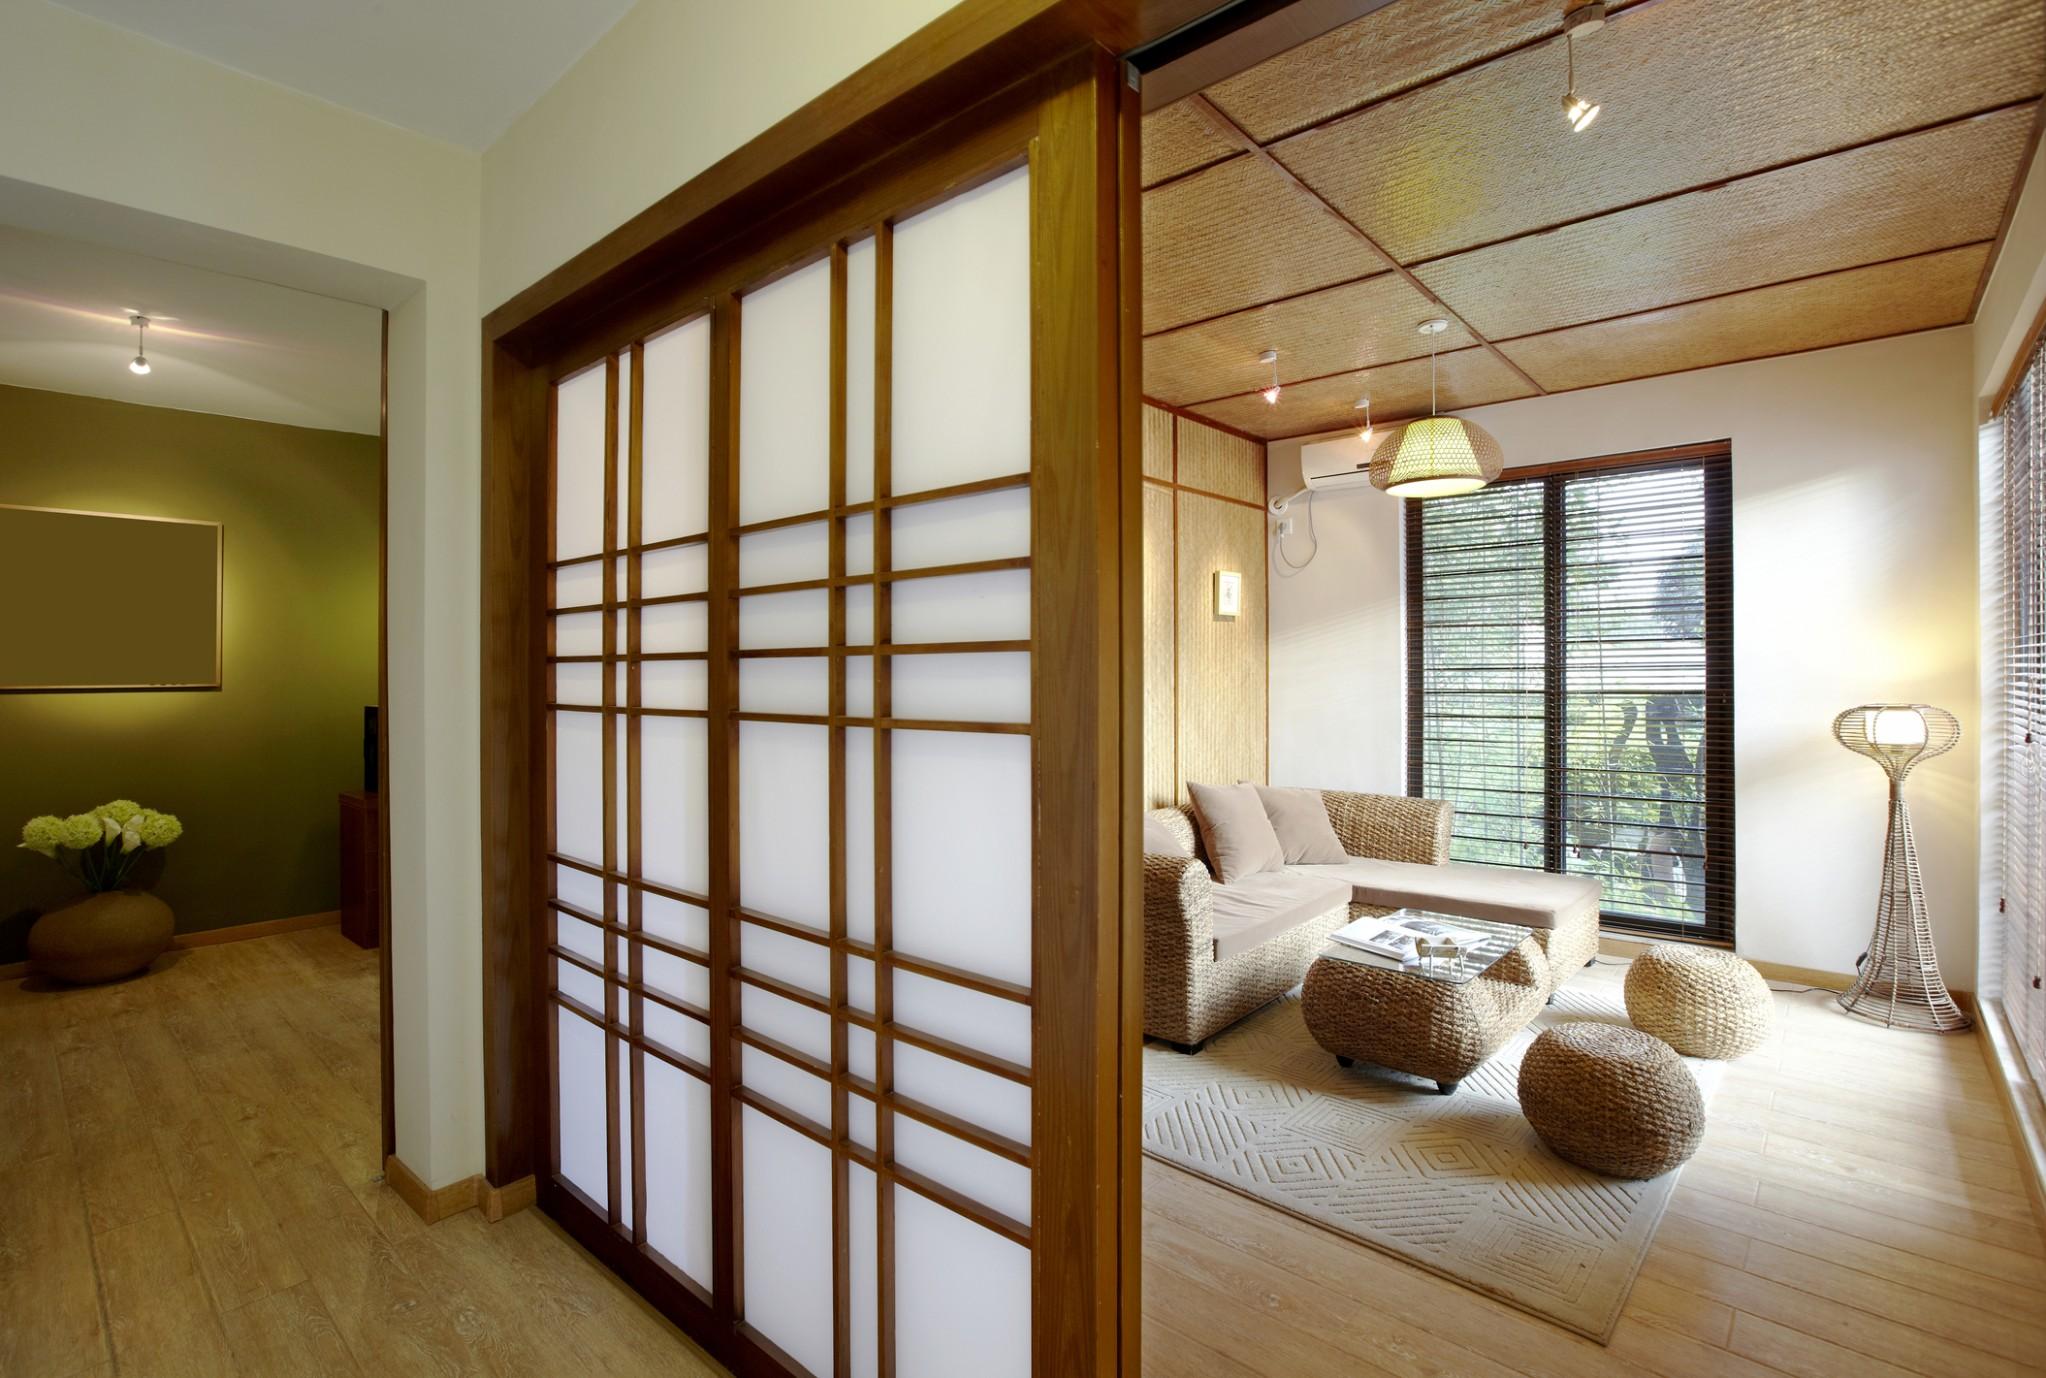 Japanese Apartment Design  LoveToKnow - Small Apartment Japanese Design